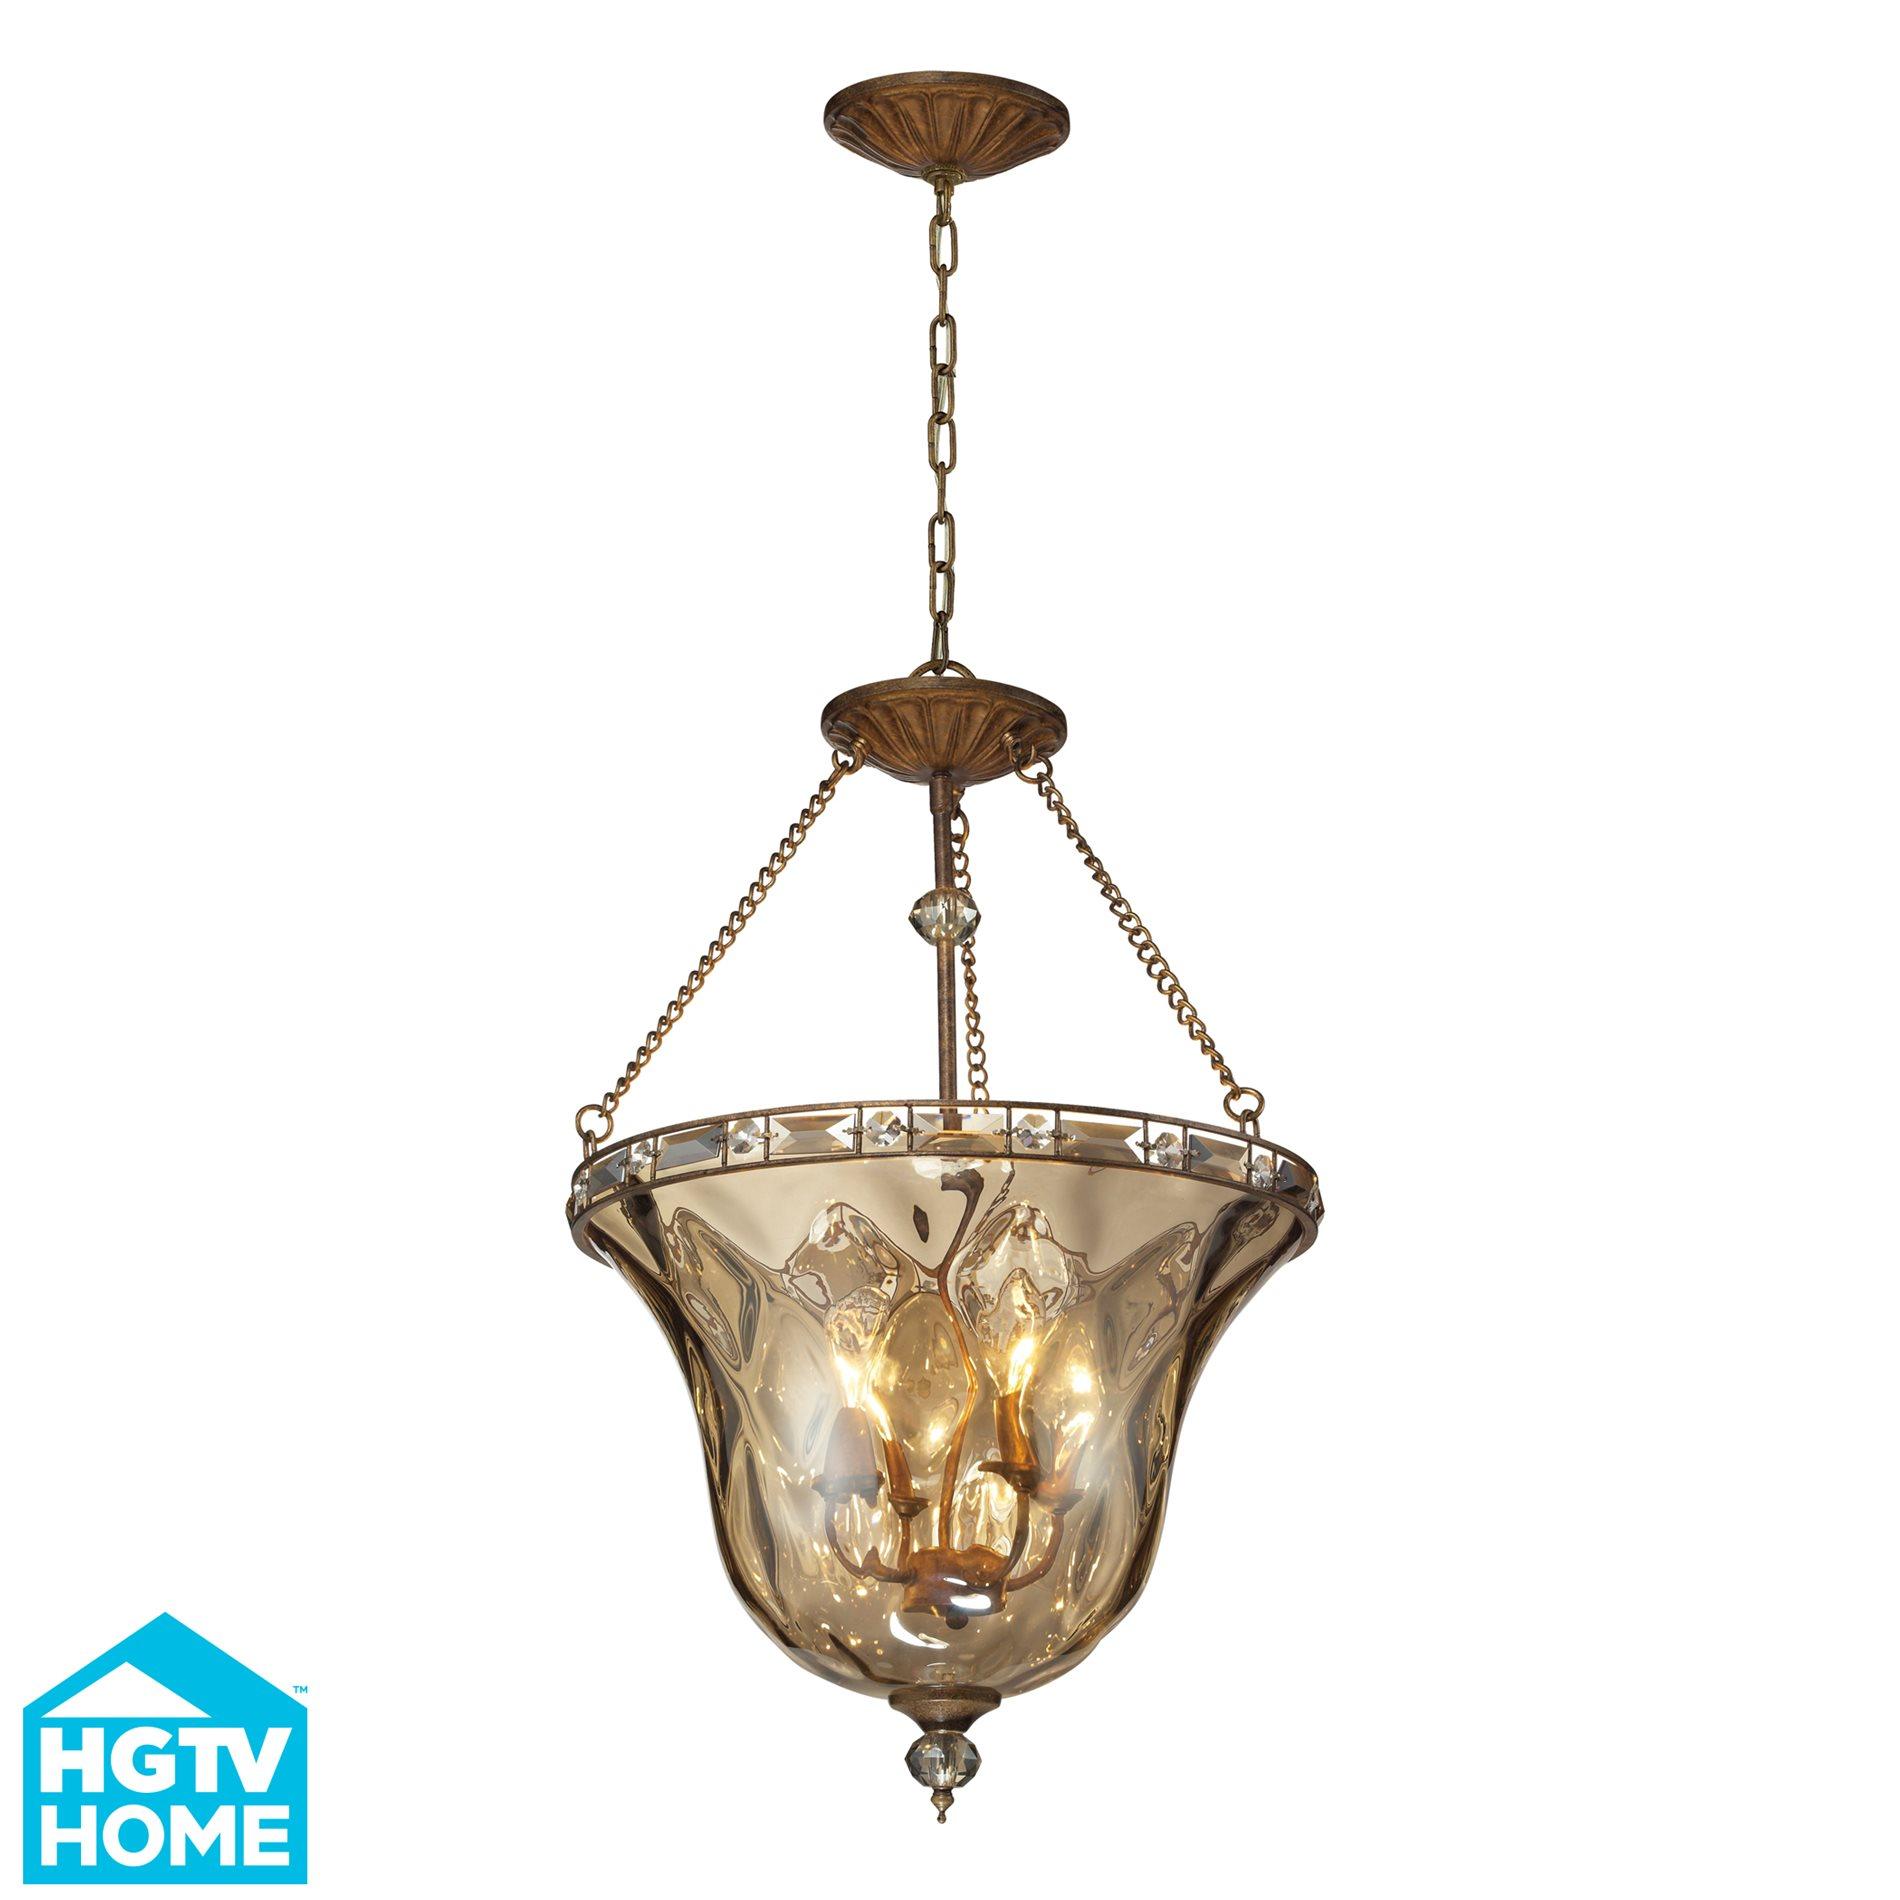 Elk Lighting Amazon: HGTV 46022/4 Cheltham Contemporary Inverted Pendant Light